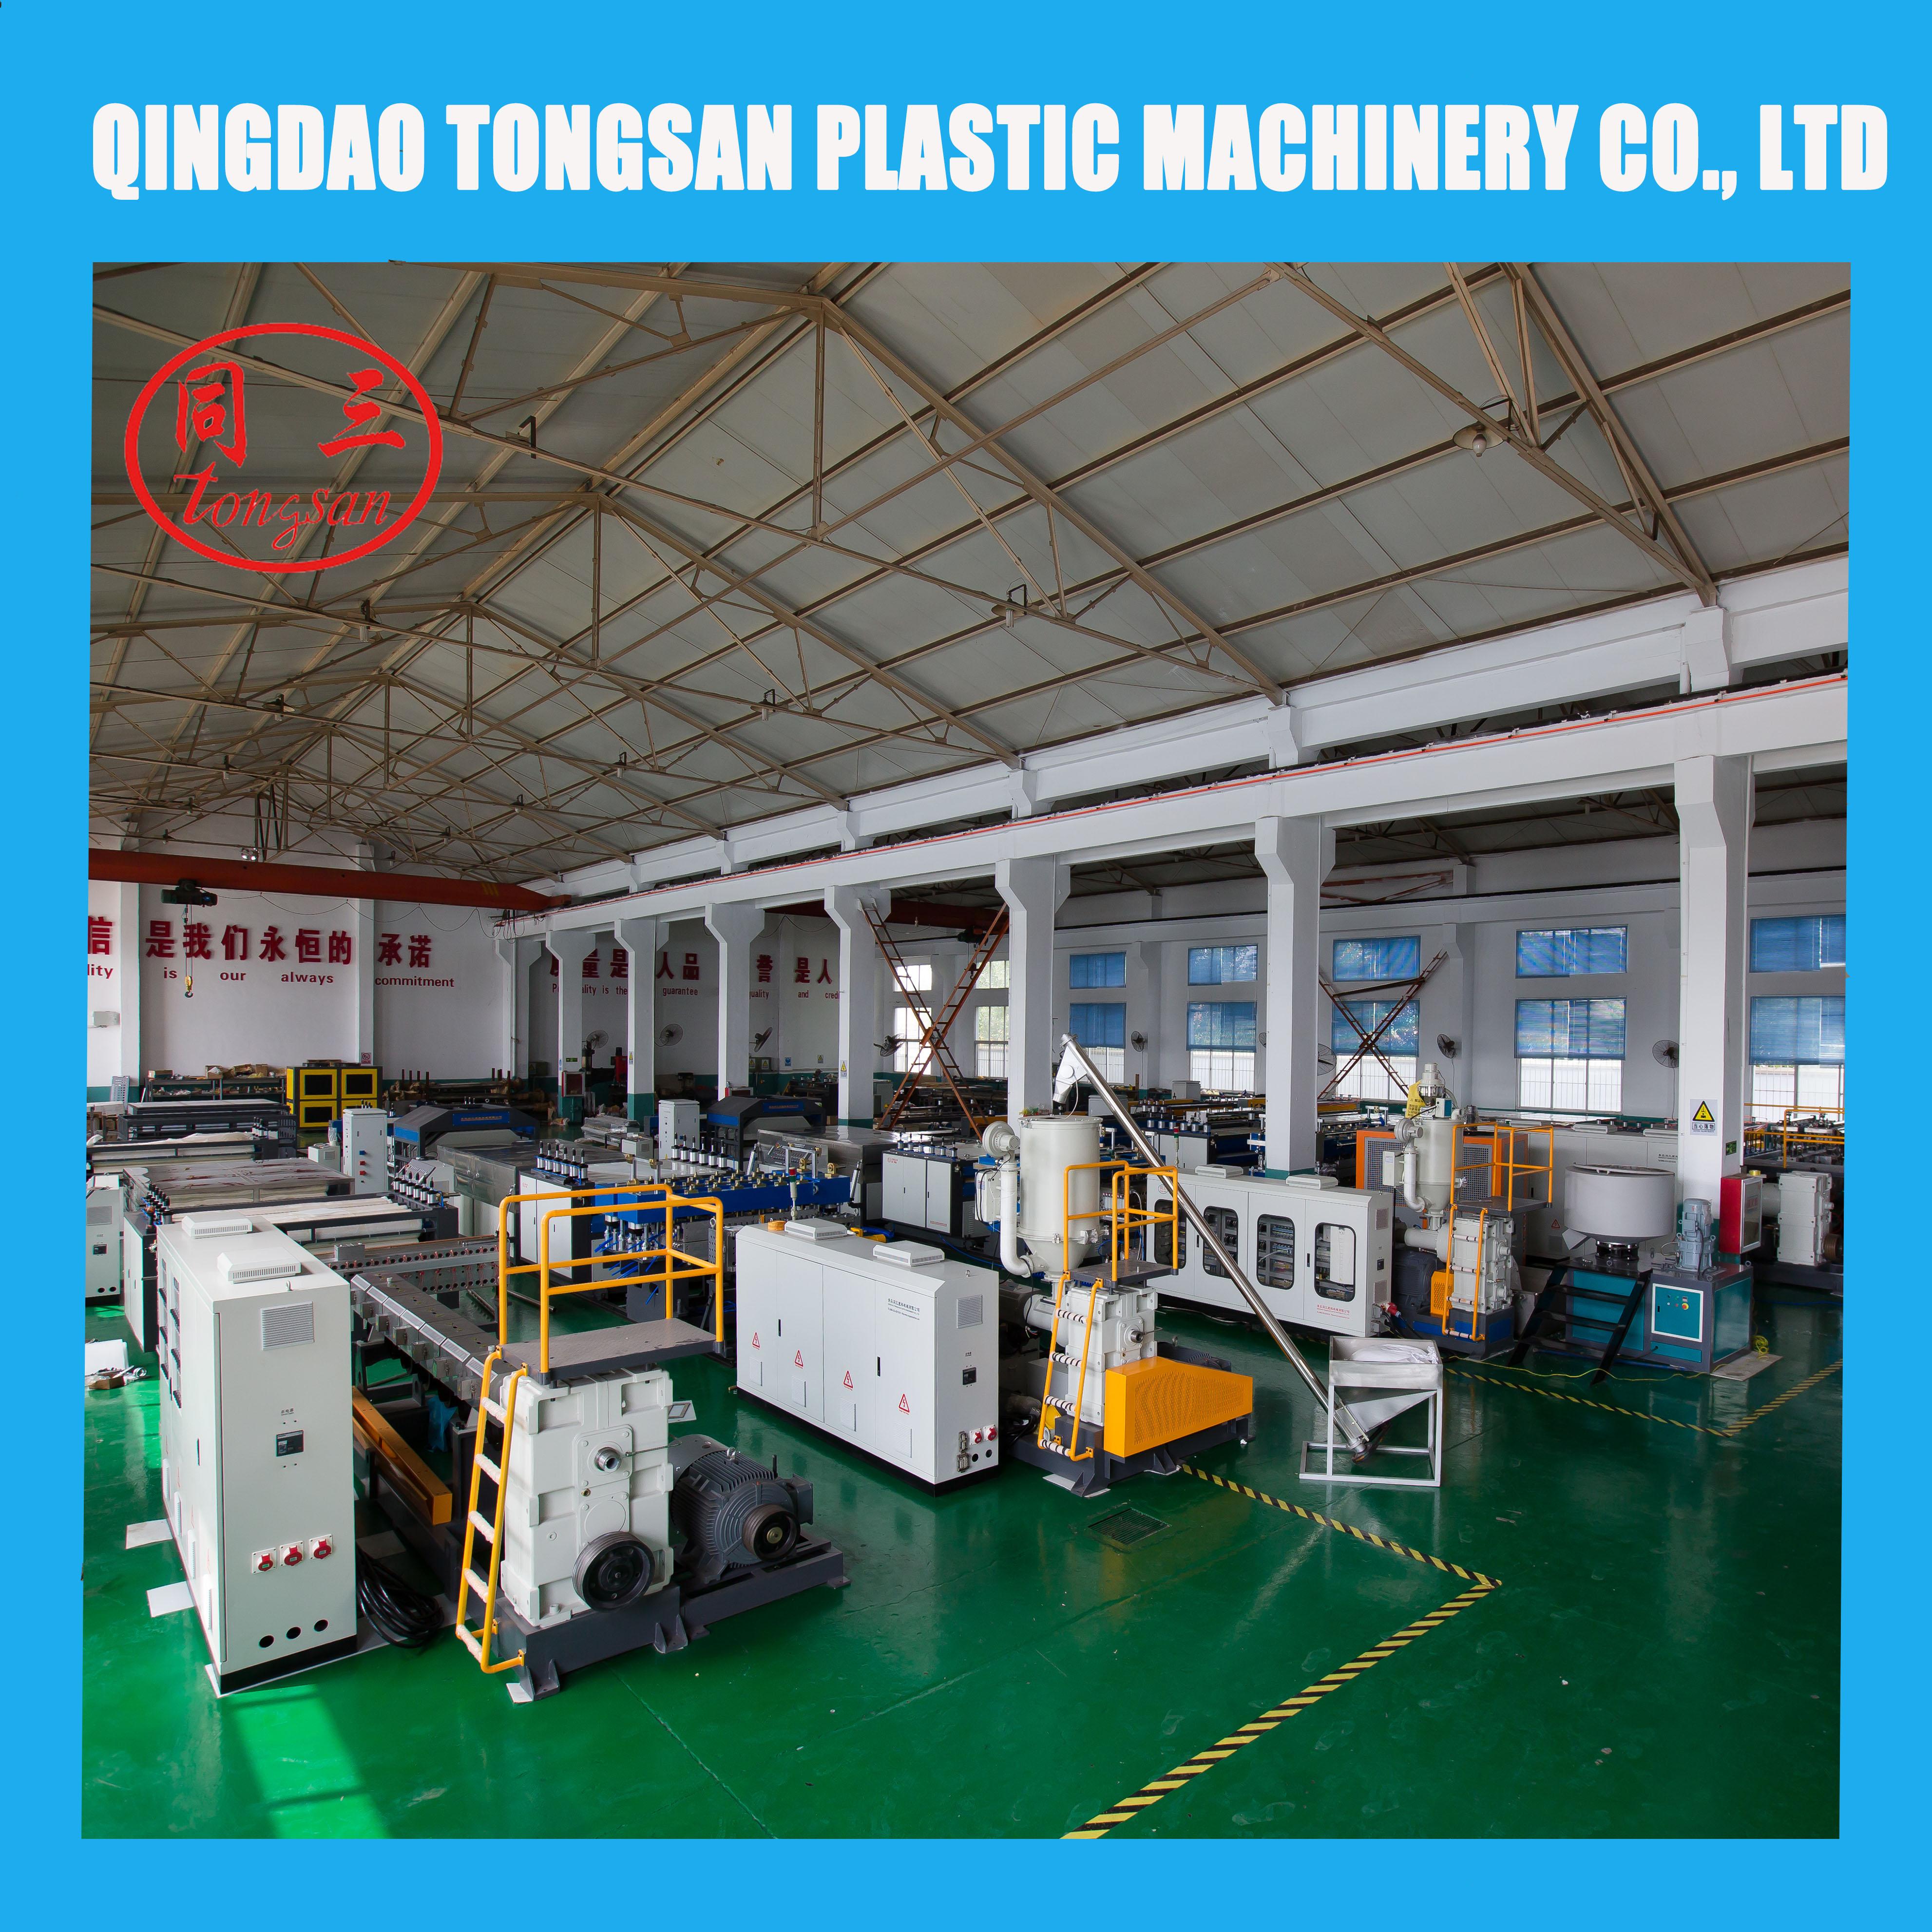 Plastic Machine - Qingdao Tongsan Plastic Machinery Co., Ltd.